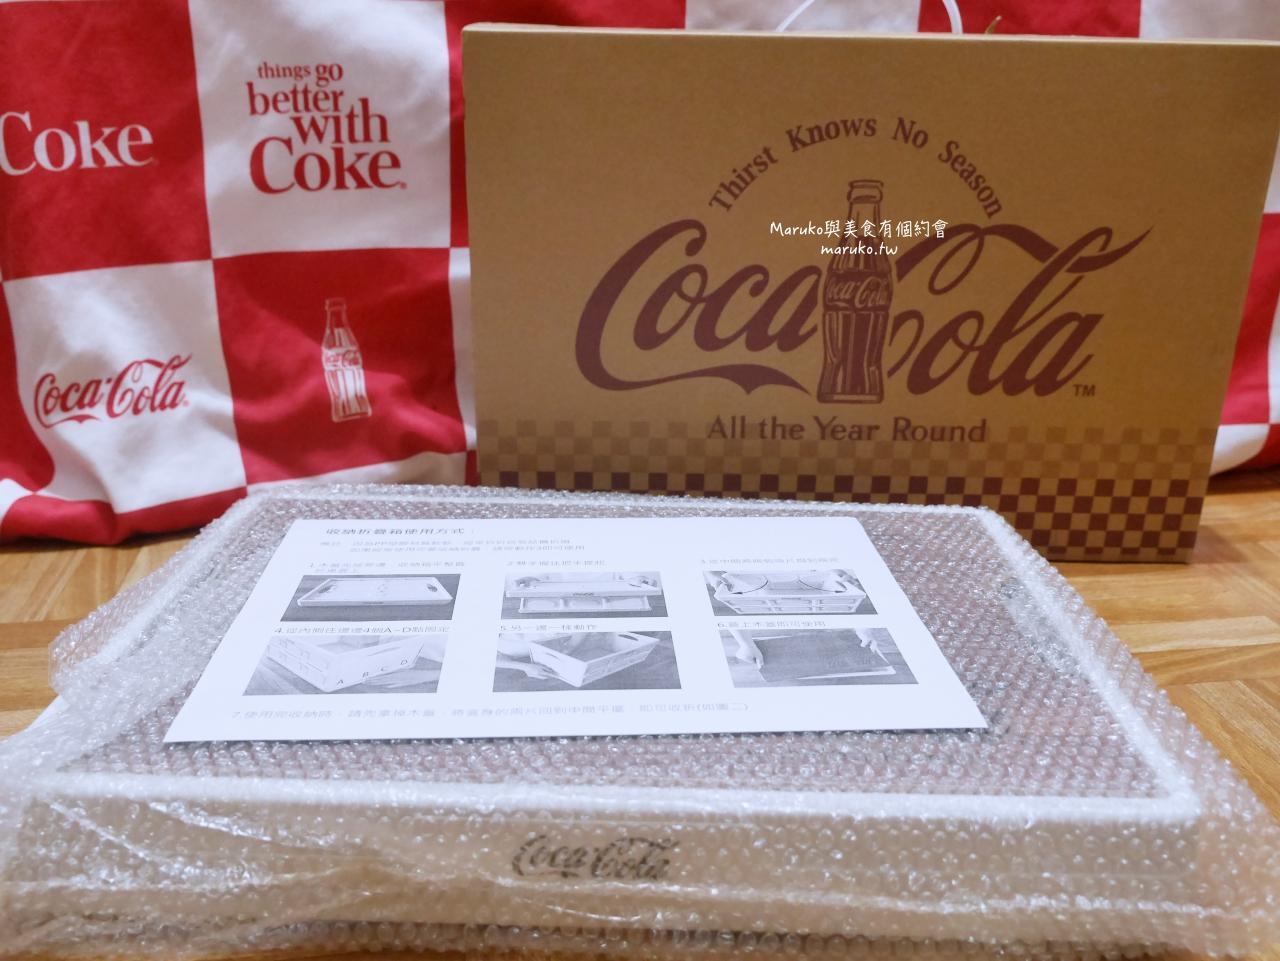 【OK便利商店】可口可樂摺疊收納箱 購買可口可樂系列換購 限量推出 @Maruko與美食有個約會